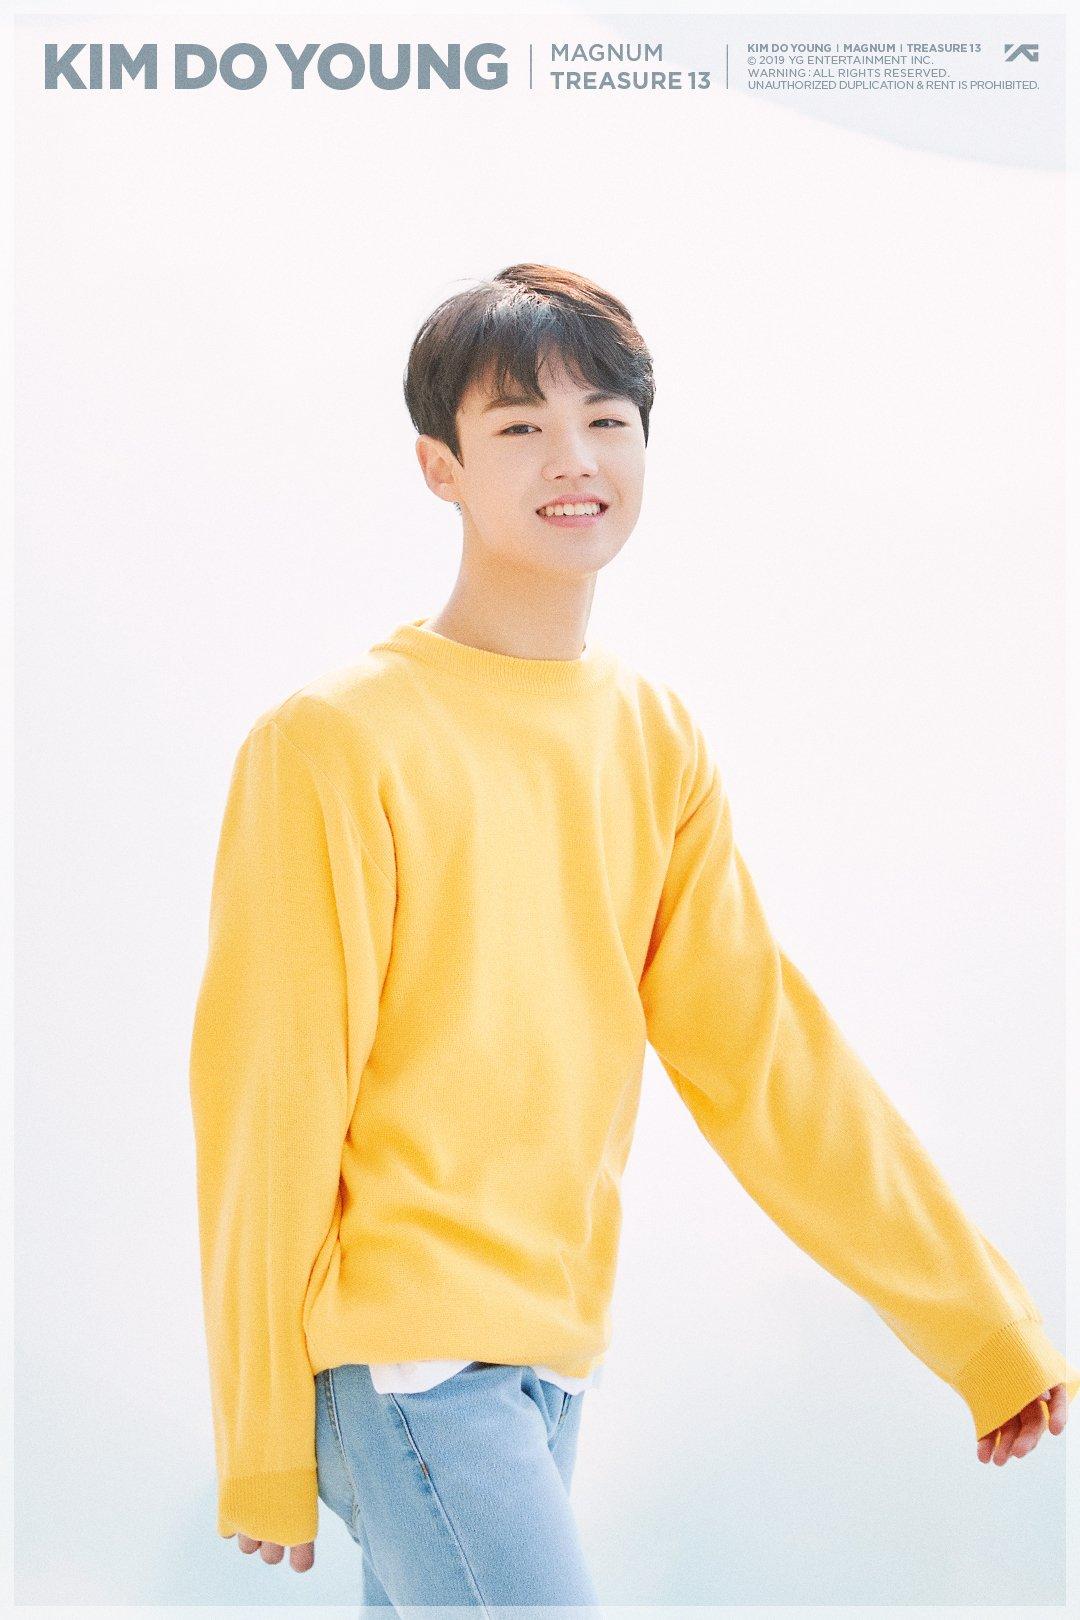 Category Doyoung Treasure Kpop Wiki Fandom